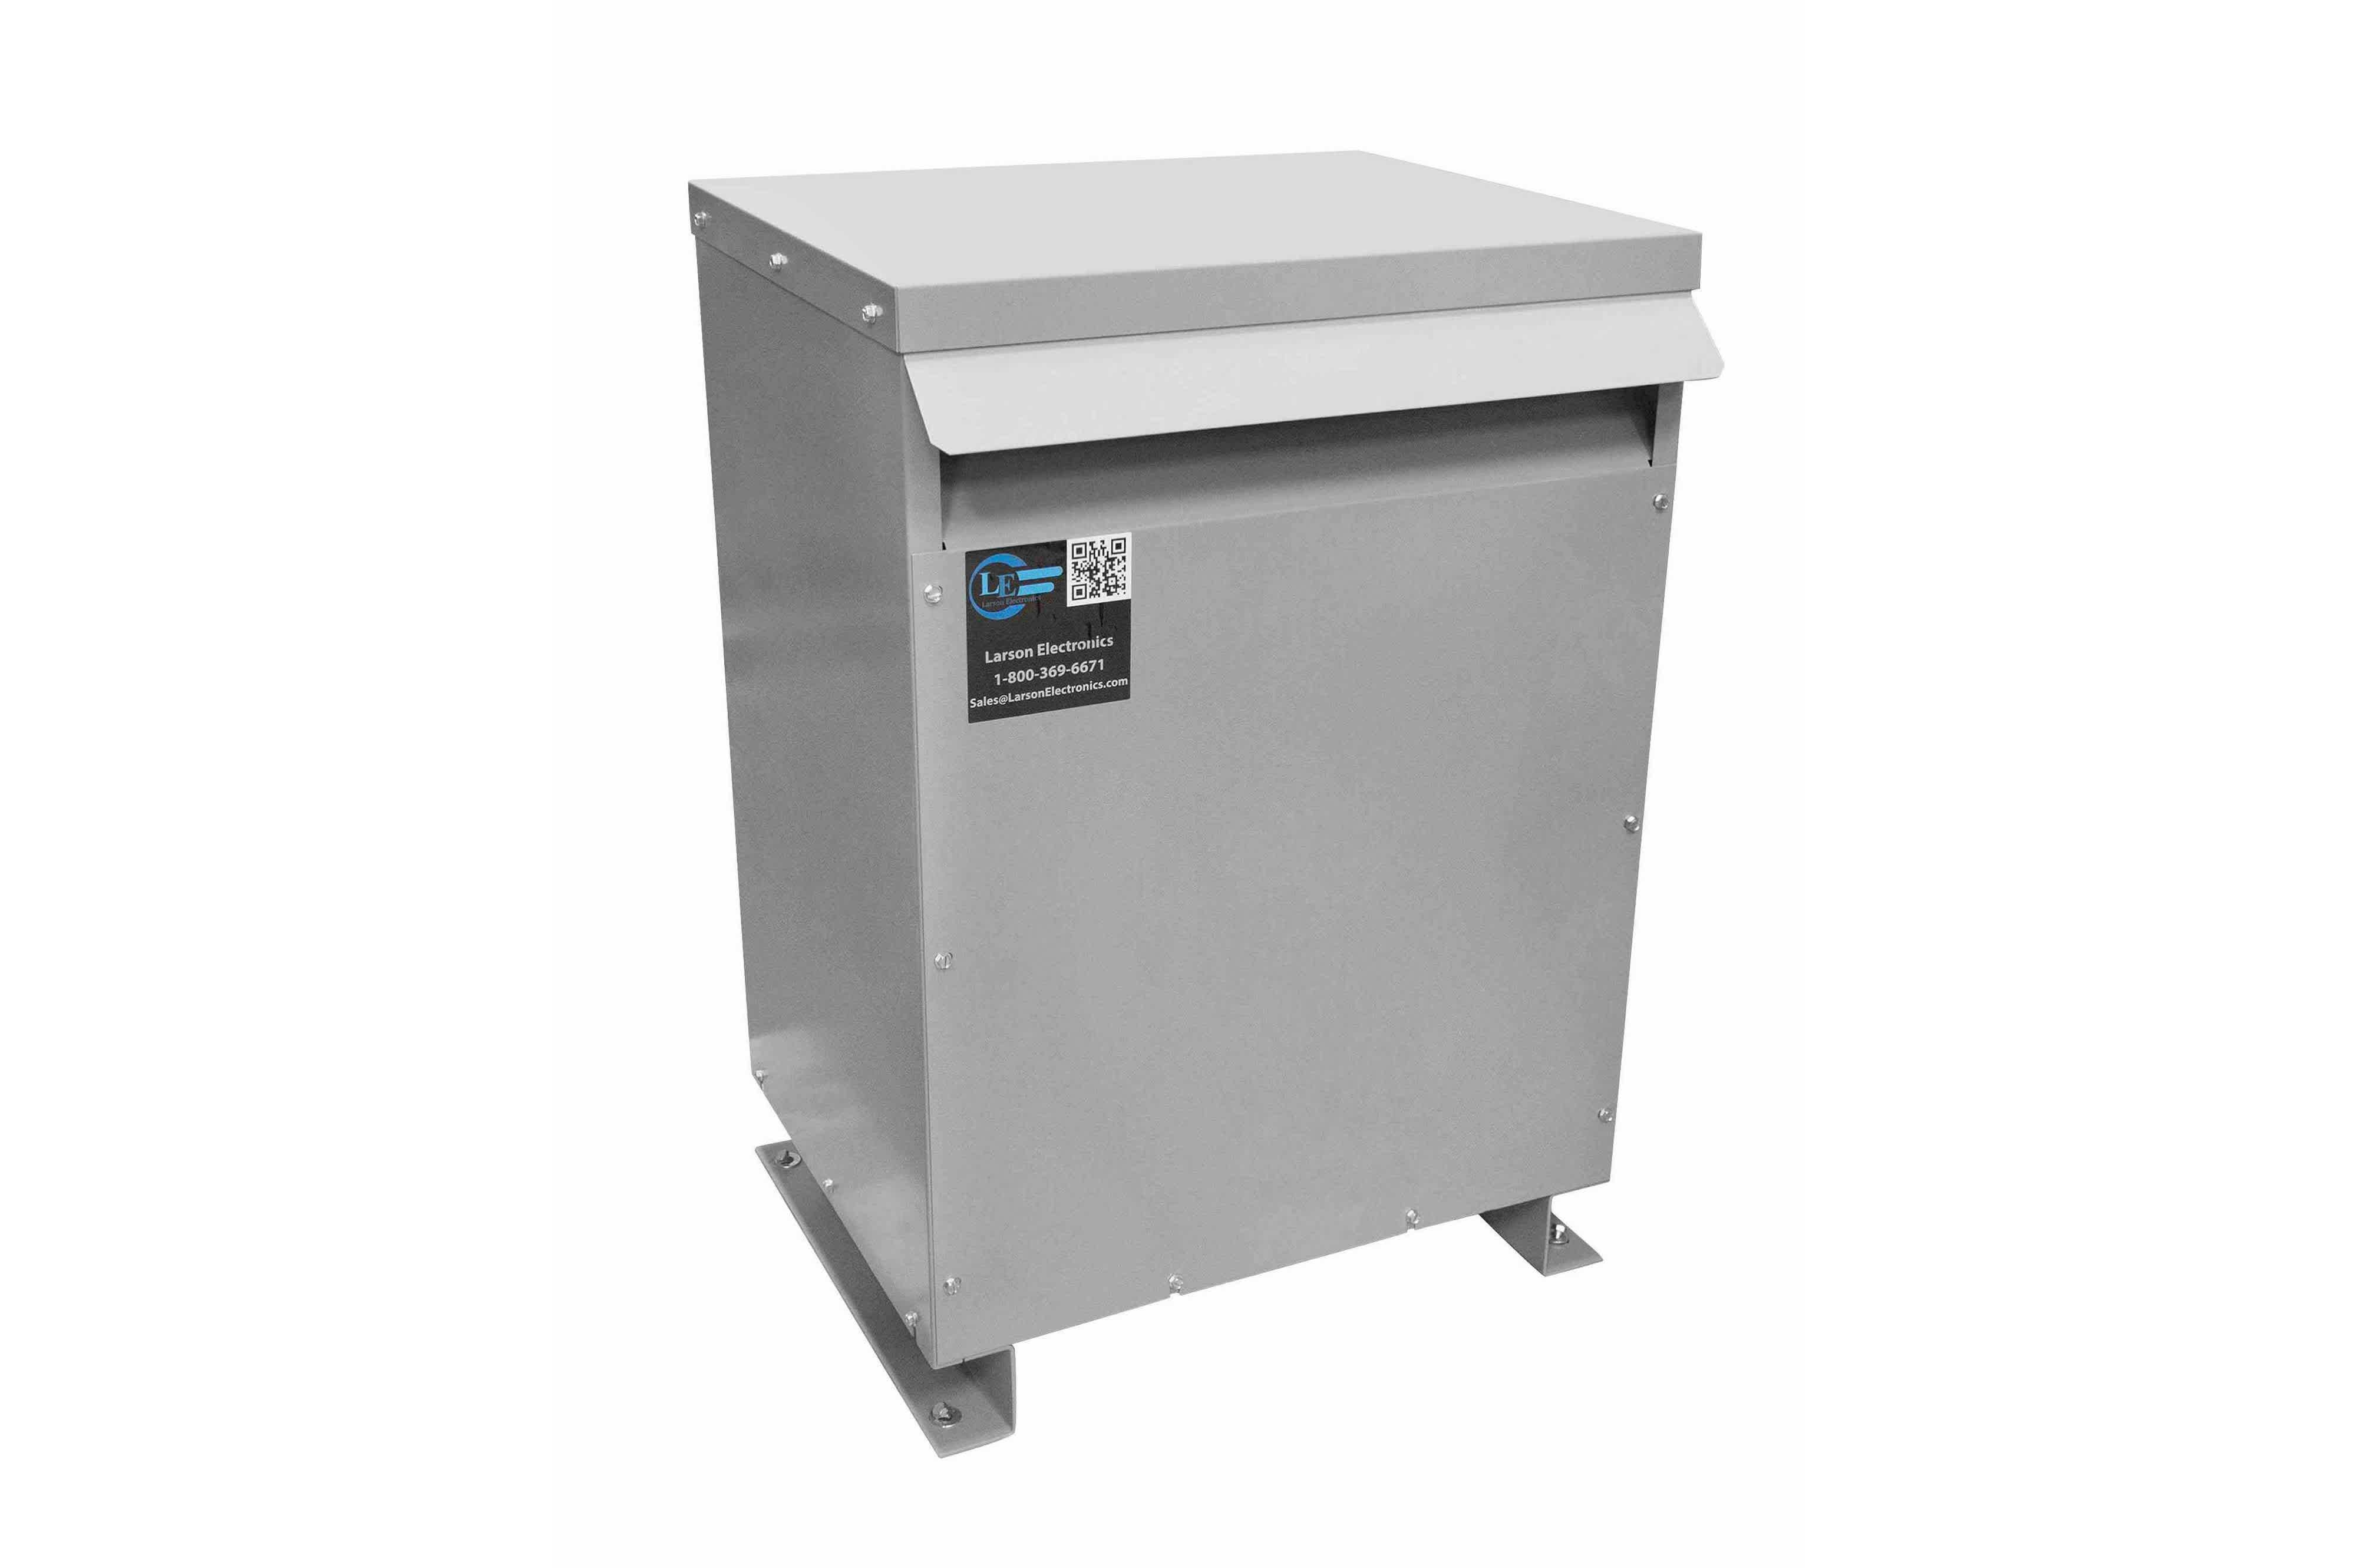 115 kVA 3PH Isolation Transformer, 575V Wye Primary, 480V Delta Secondary, N3R, Ventilated, 60 Hz